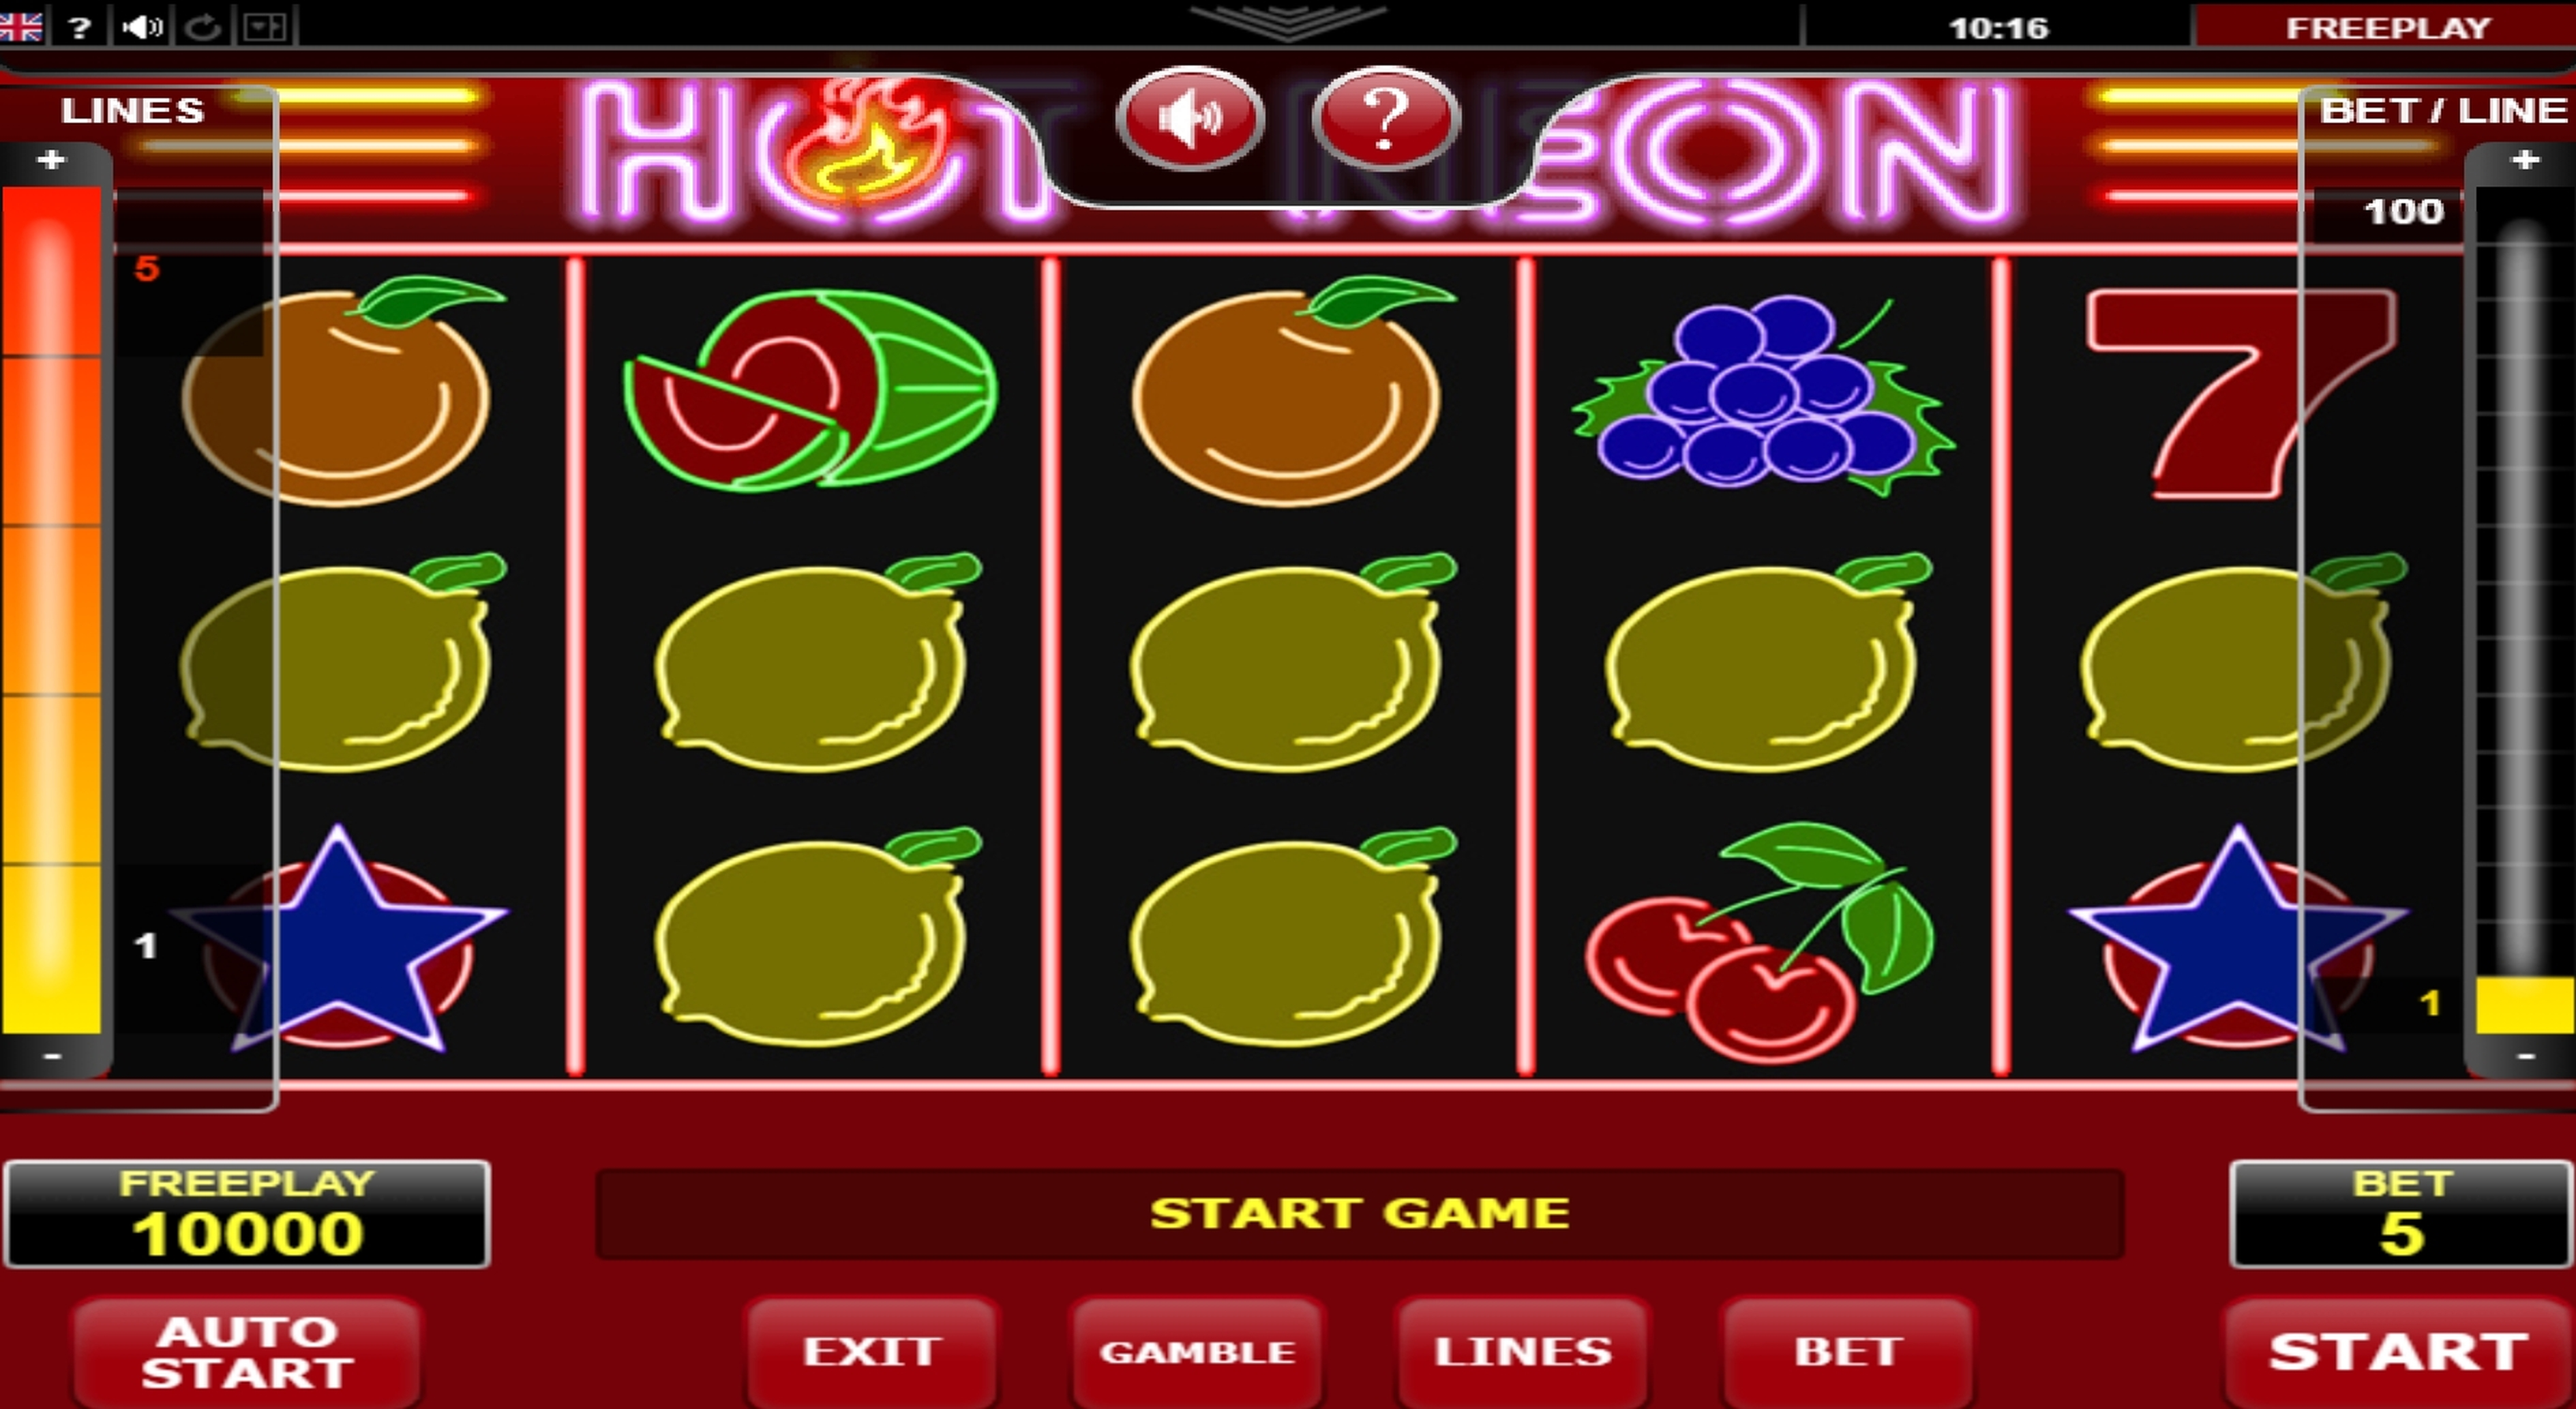 Slot game win